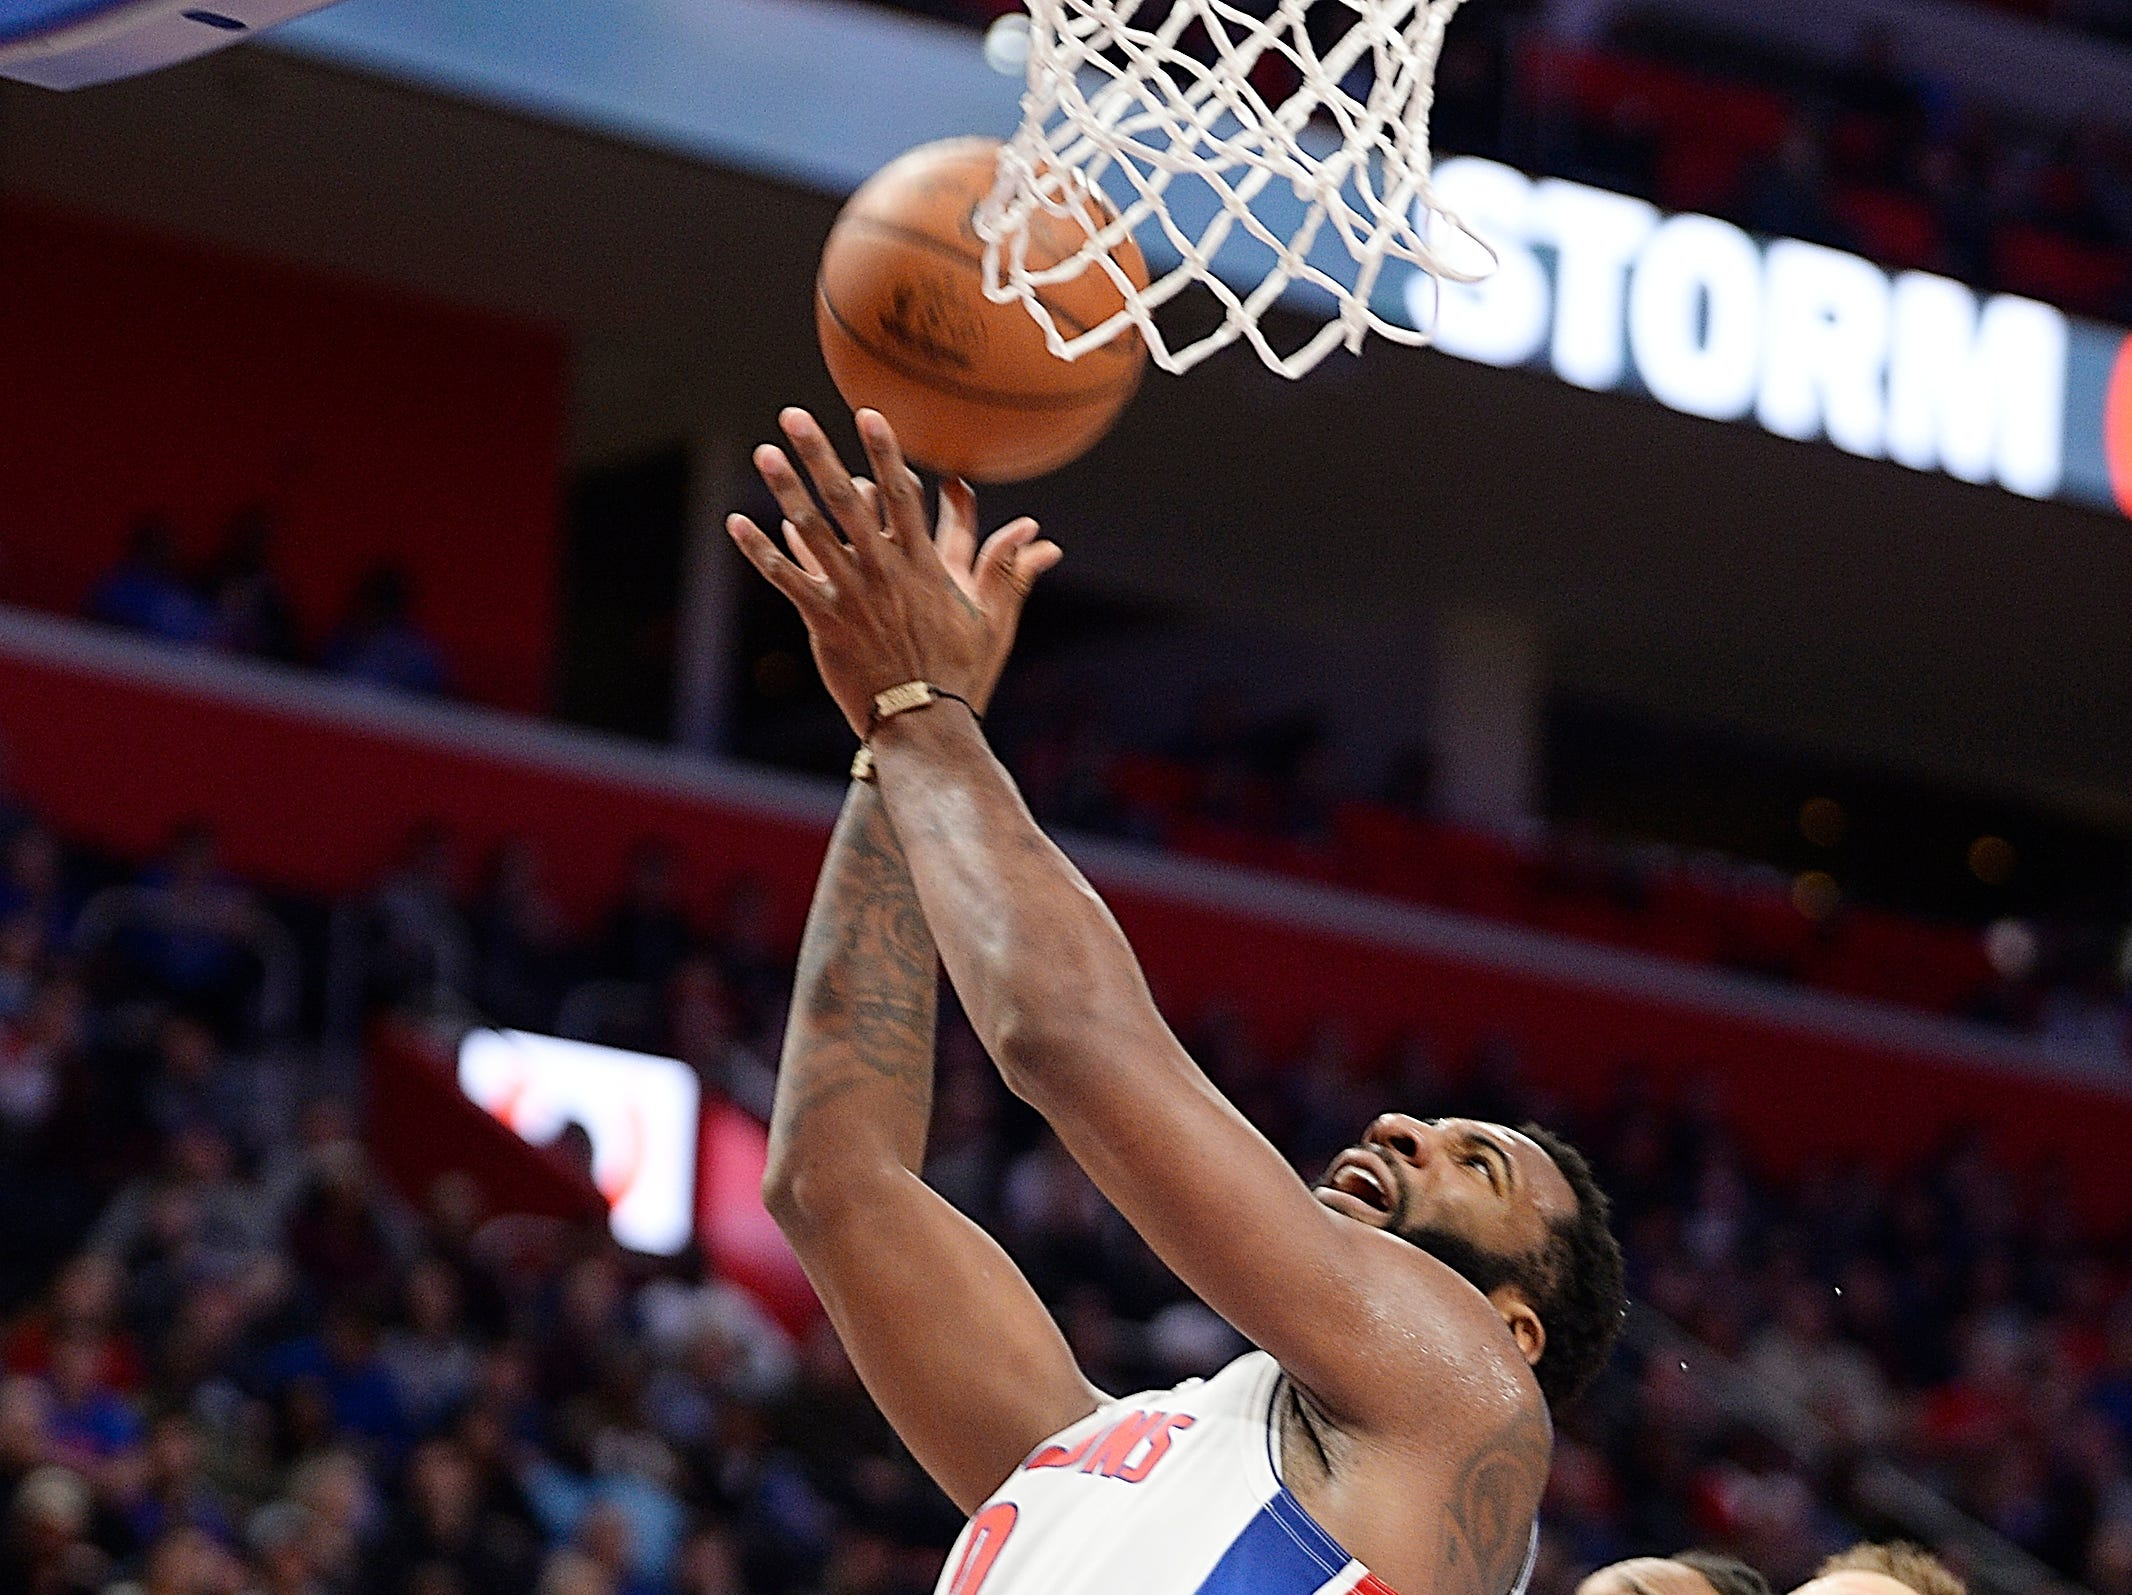 Pistons' Andre Drummond scores over Bulls' Wayne Selden Jr. in the third quarter.